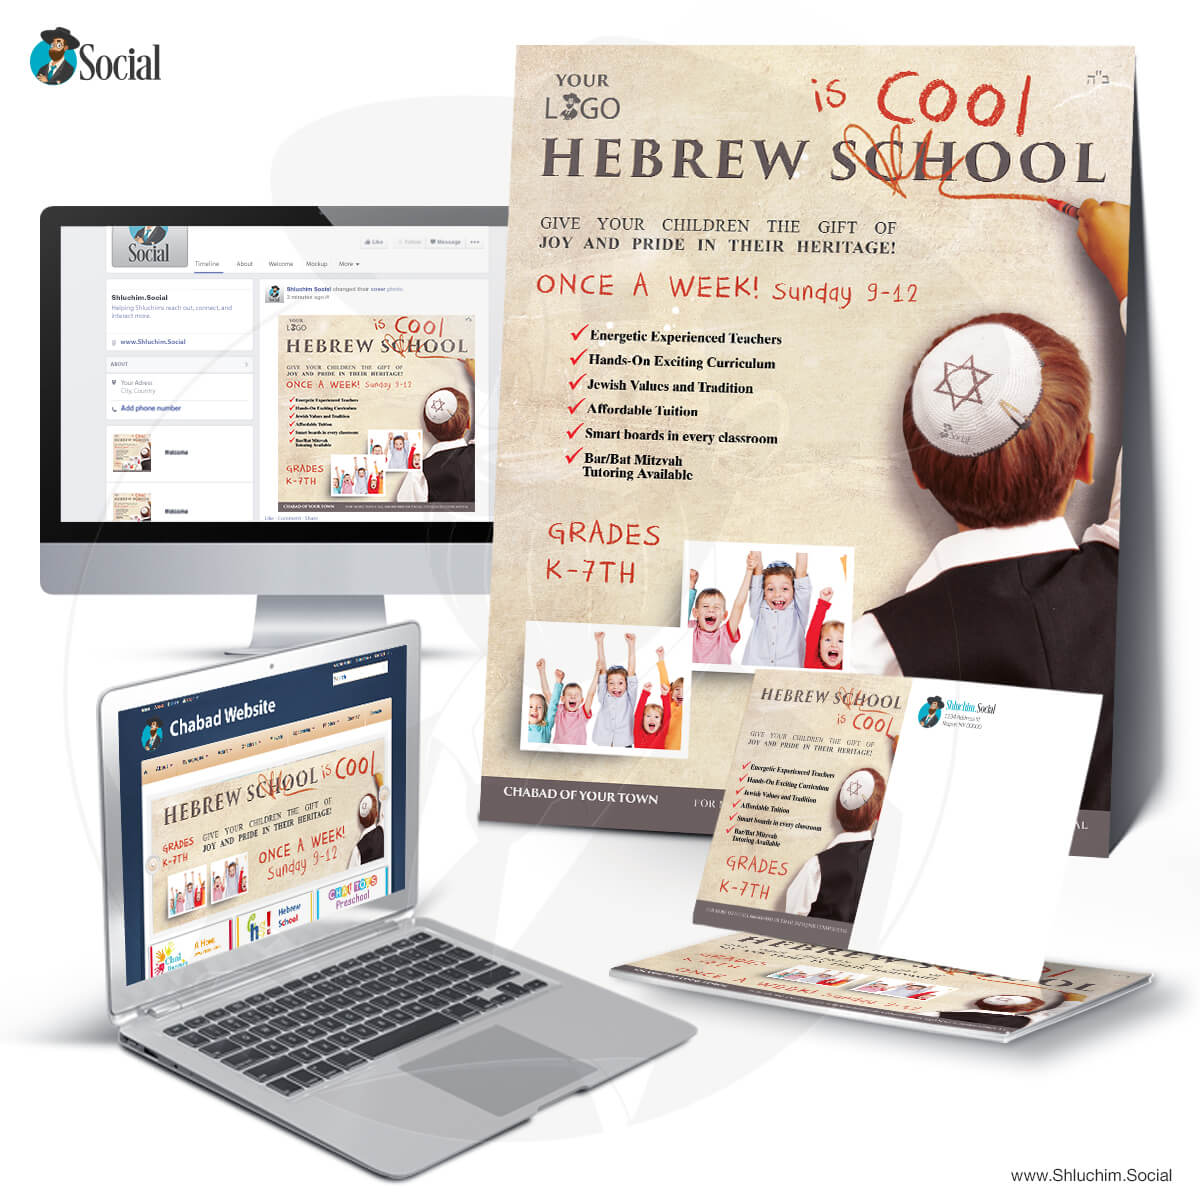 Hebrew is Cool